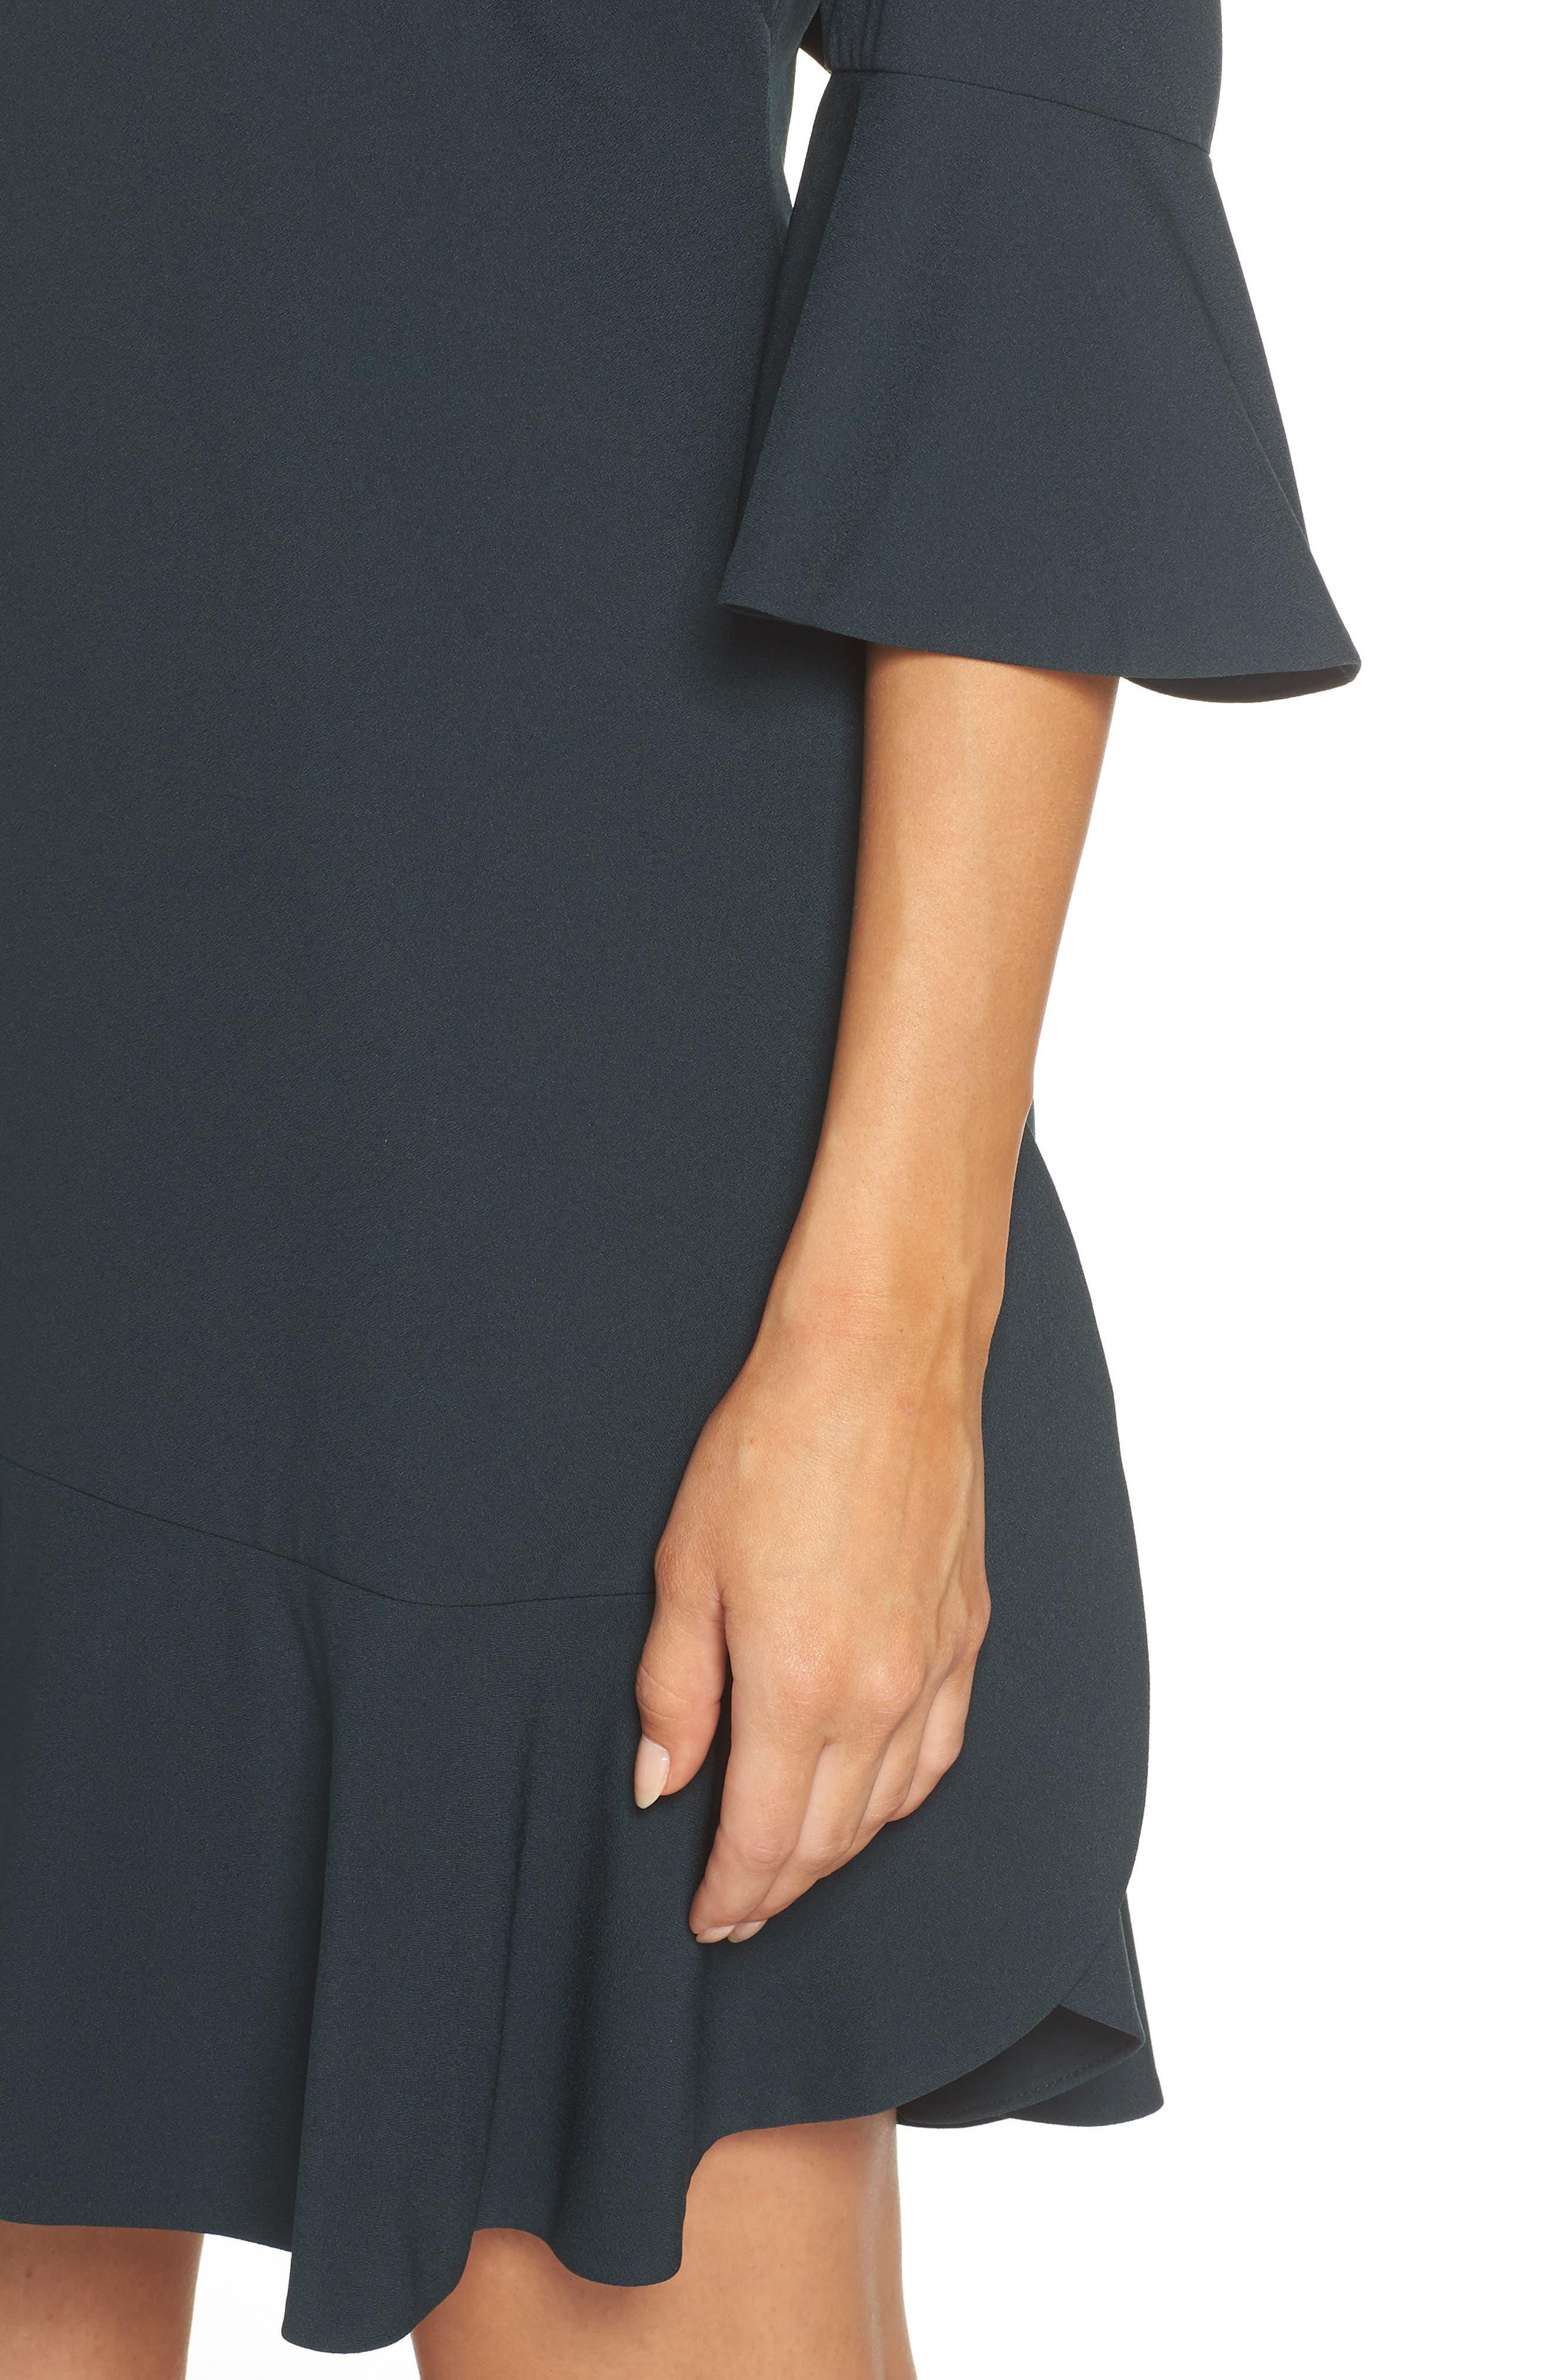 Bell Sleeve Dress,                             Alternate thumbnail 4, color,                             GREEN BUG